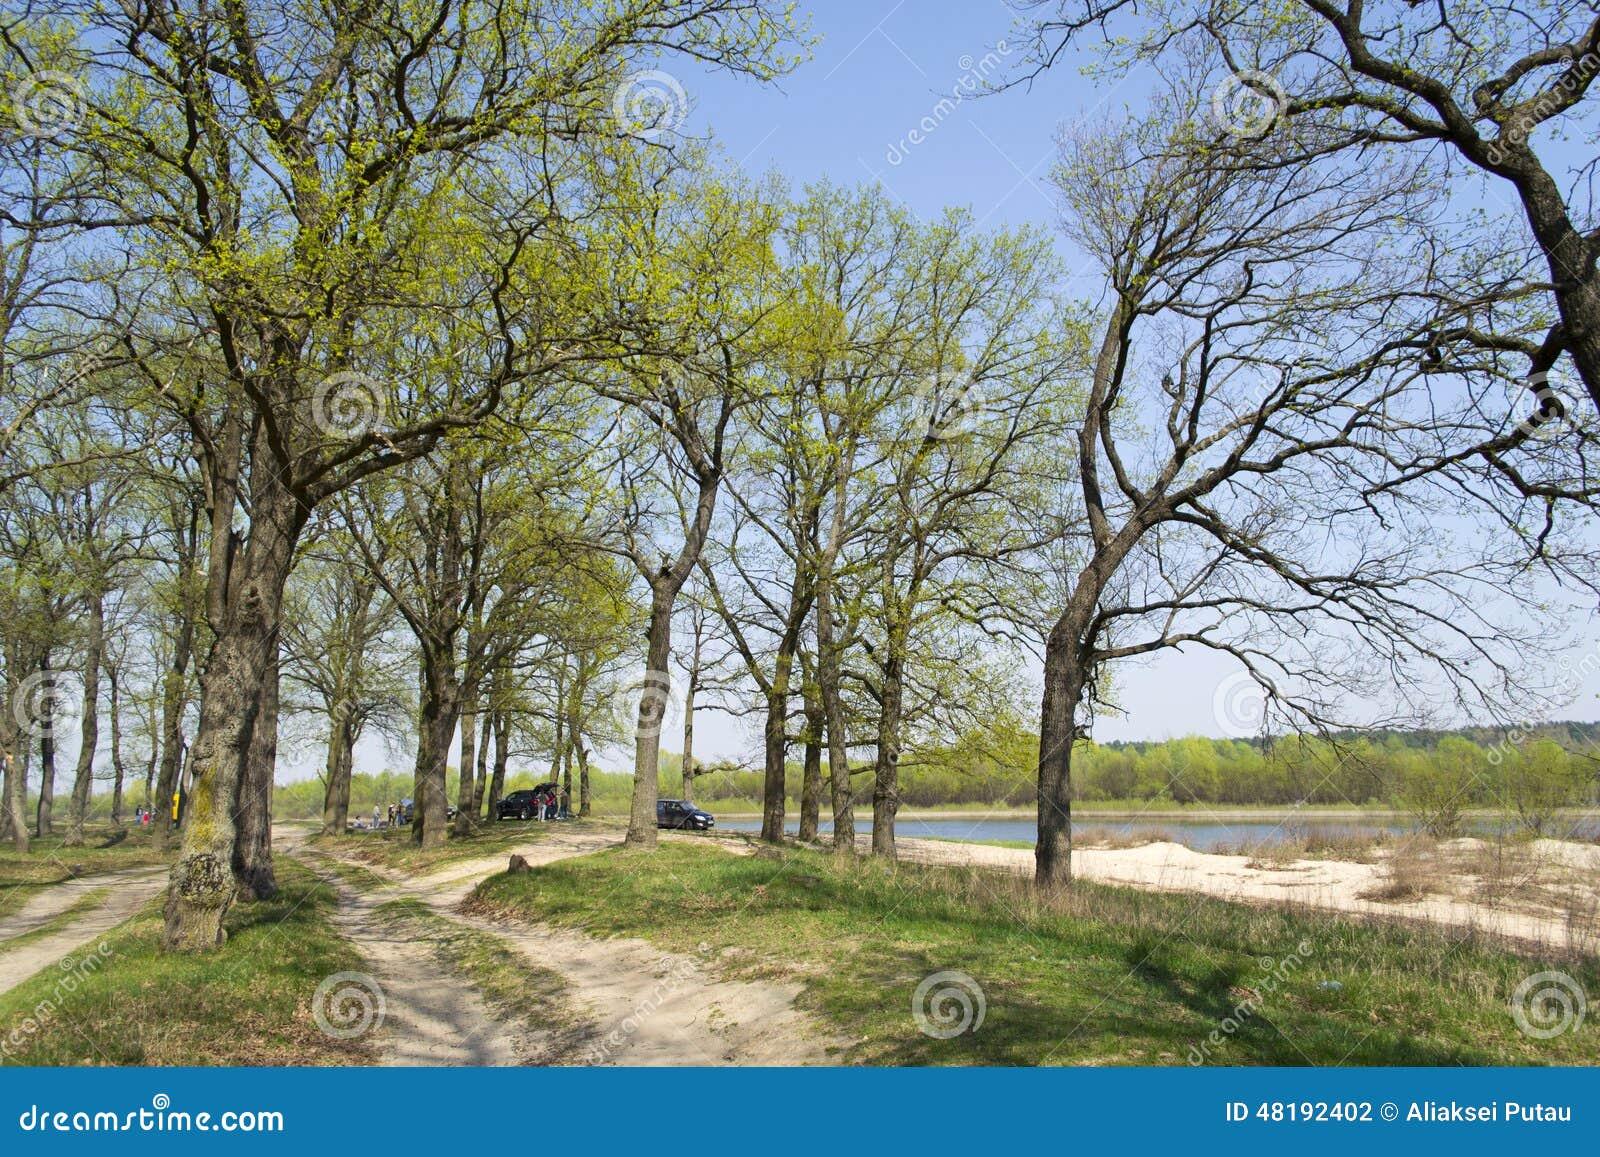 Rest on the river Bityug in the Voronezh region 92